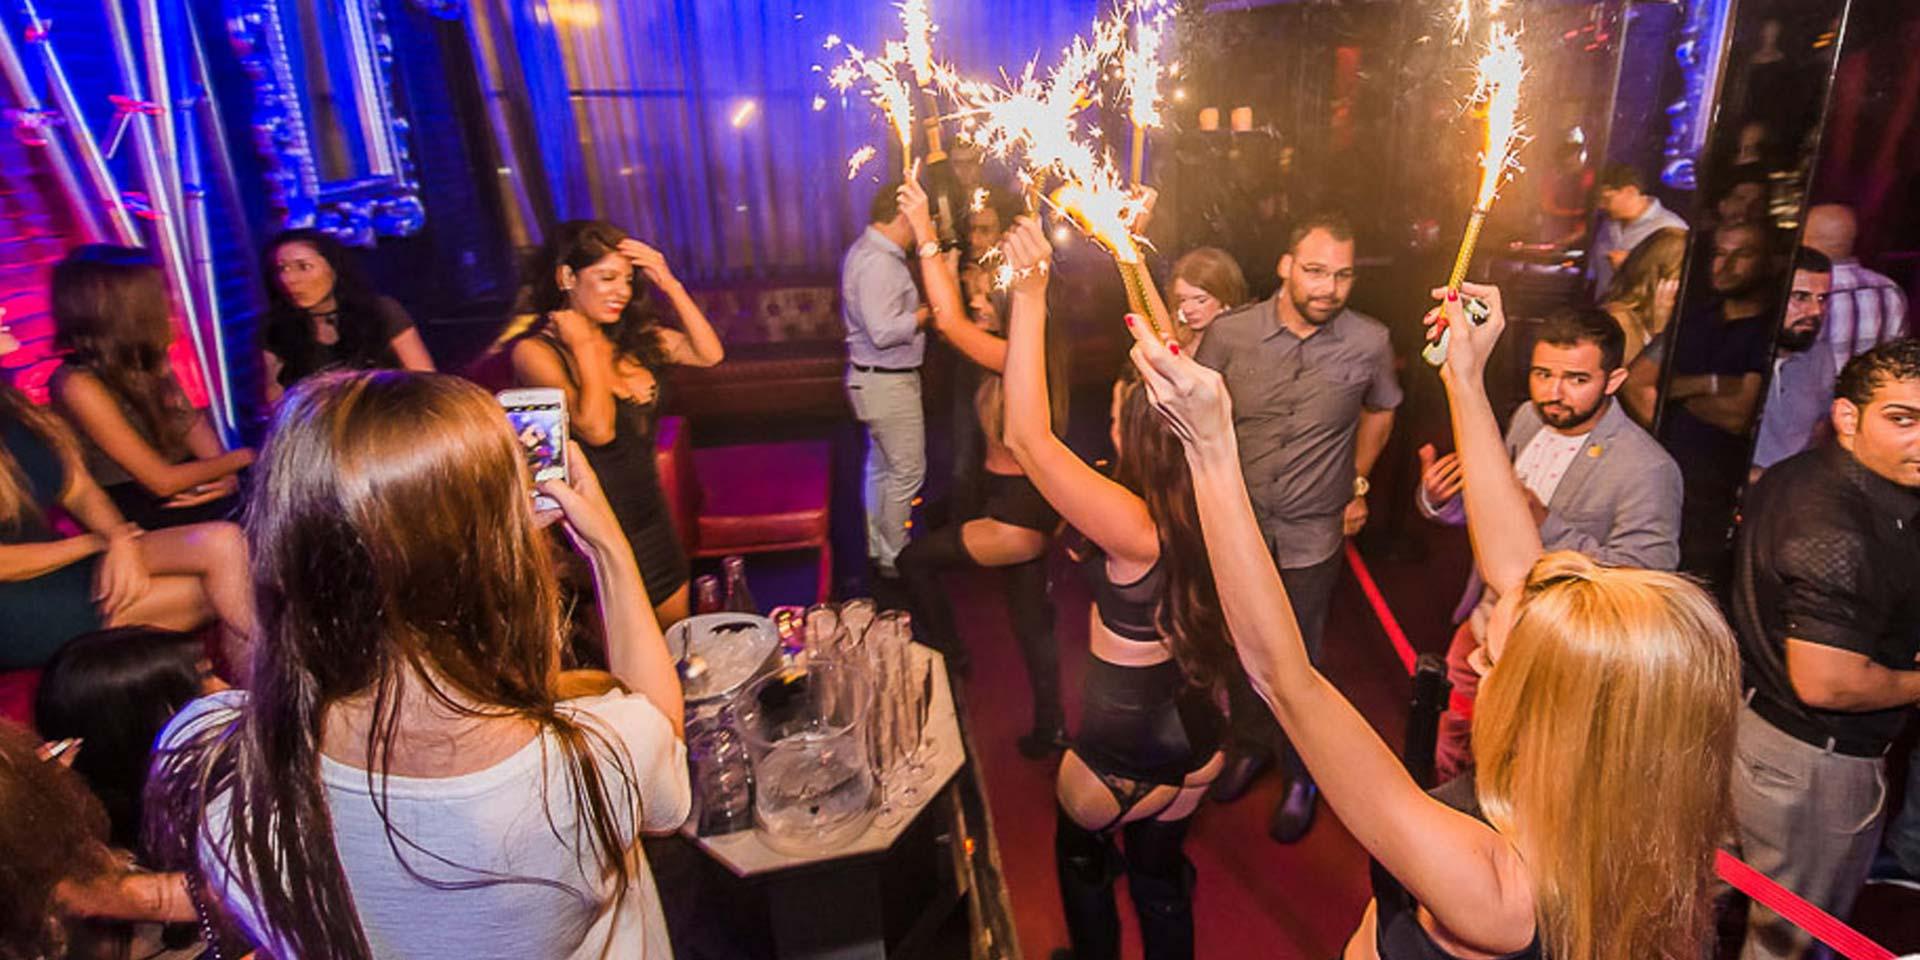 Industry Night at Side Bar Nightclub 10/21/15